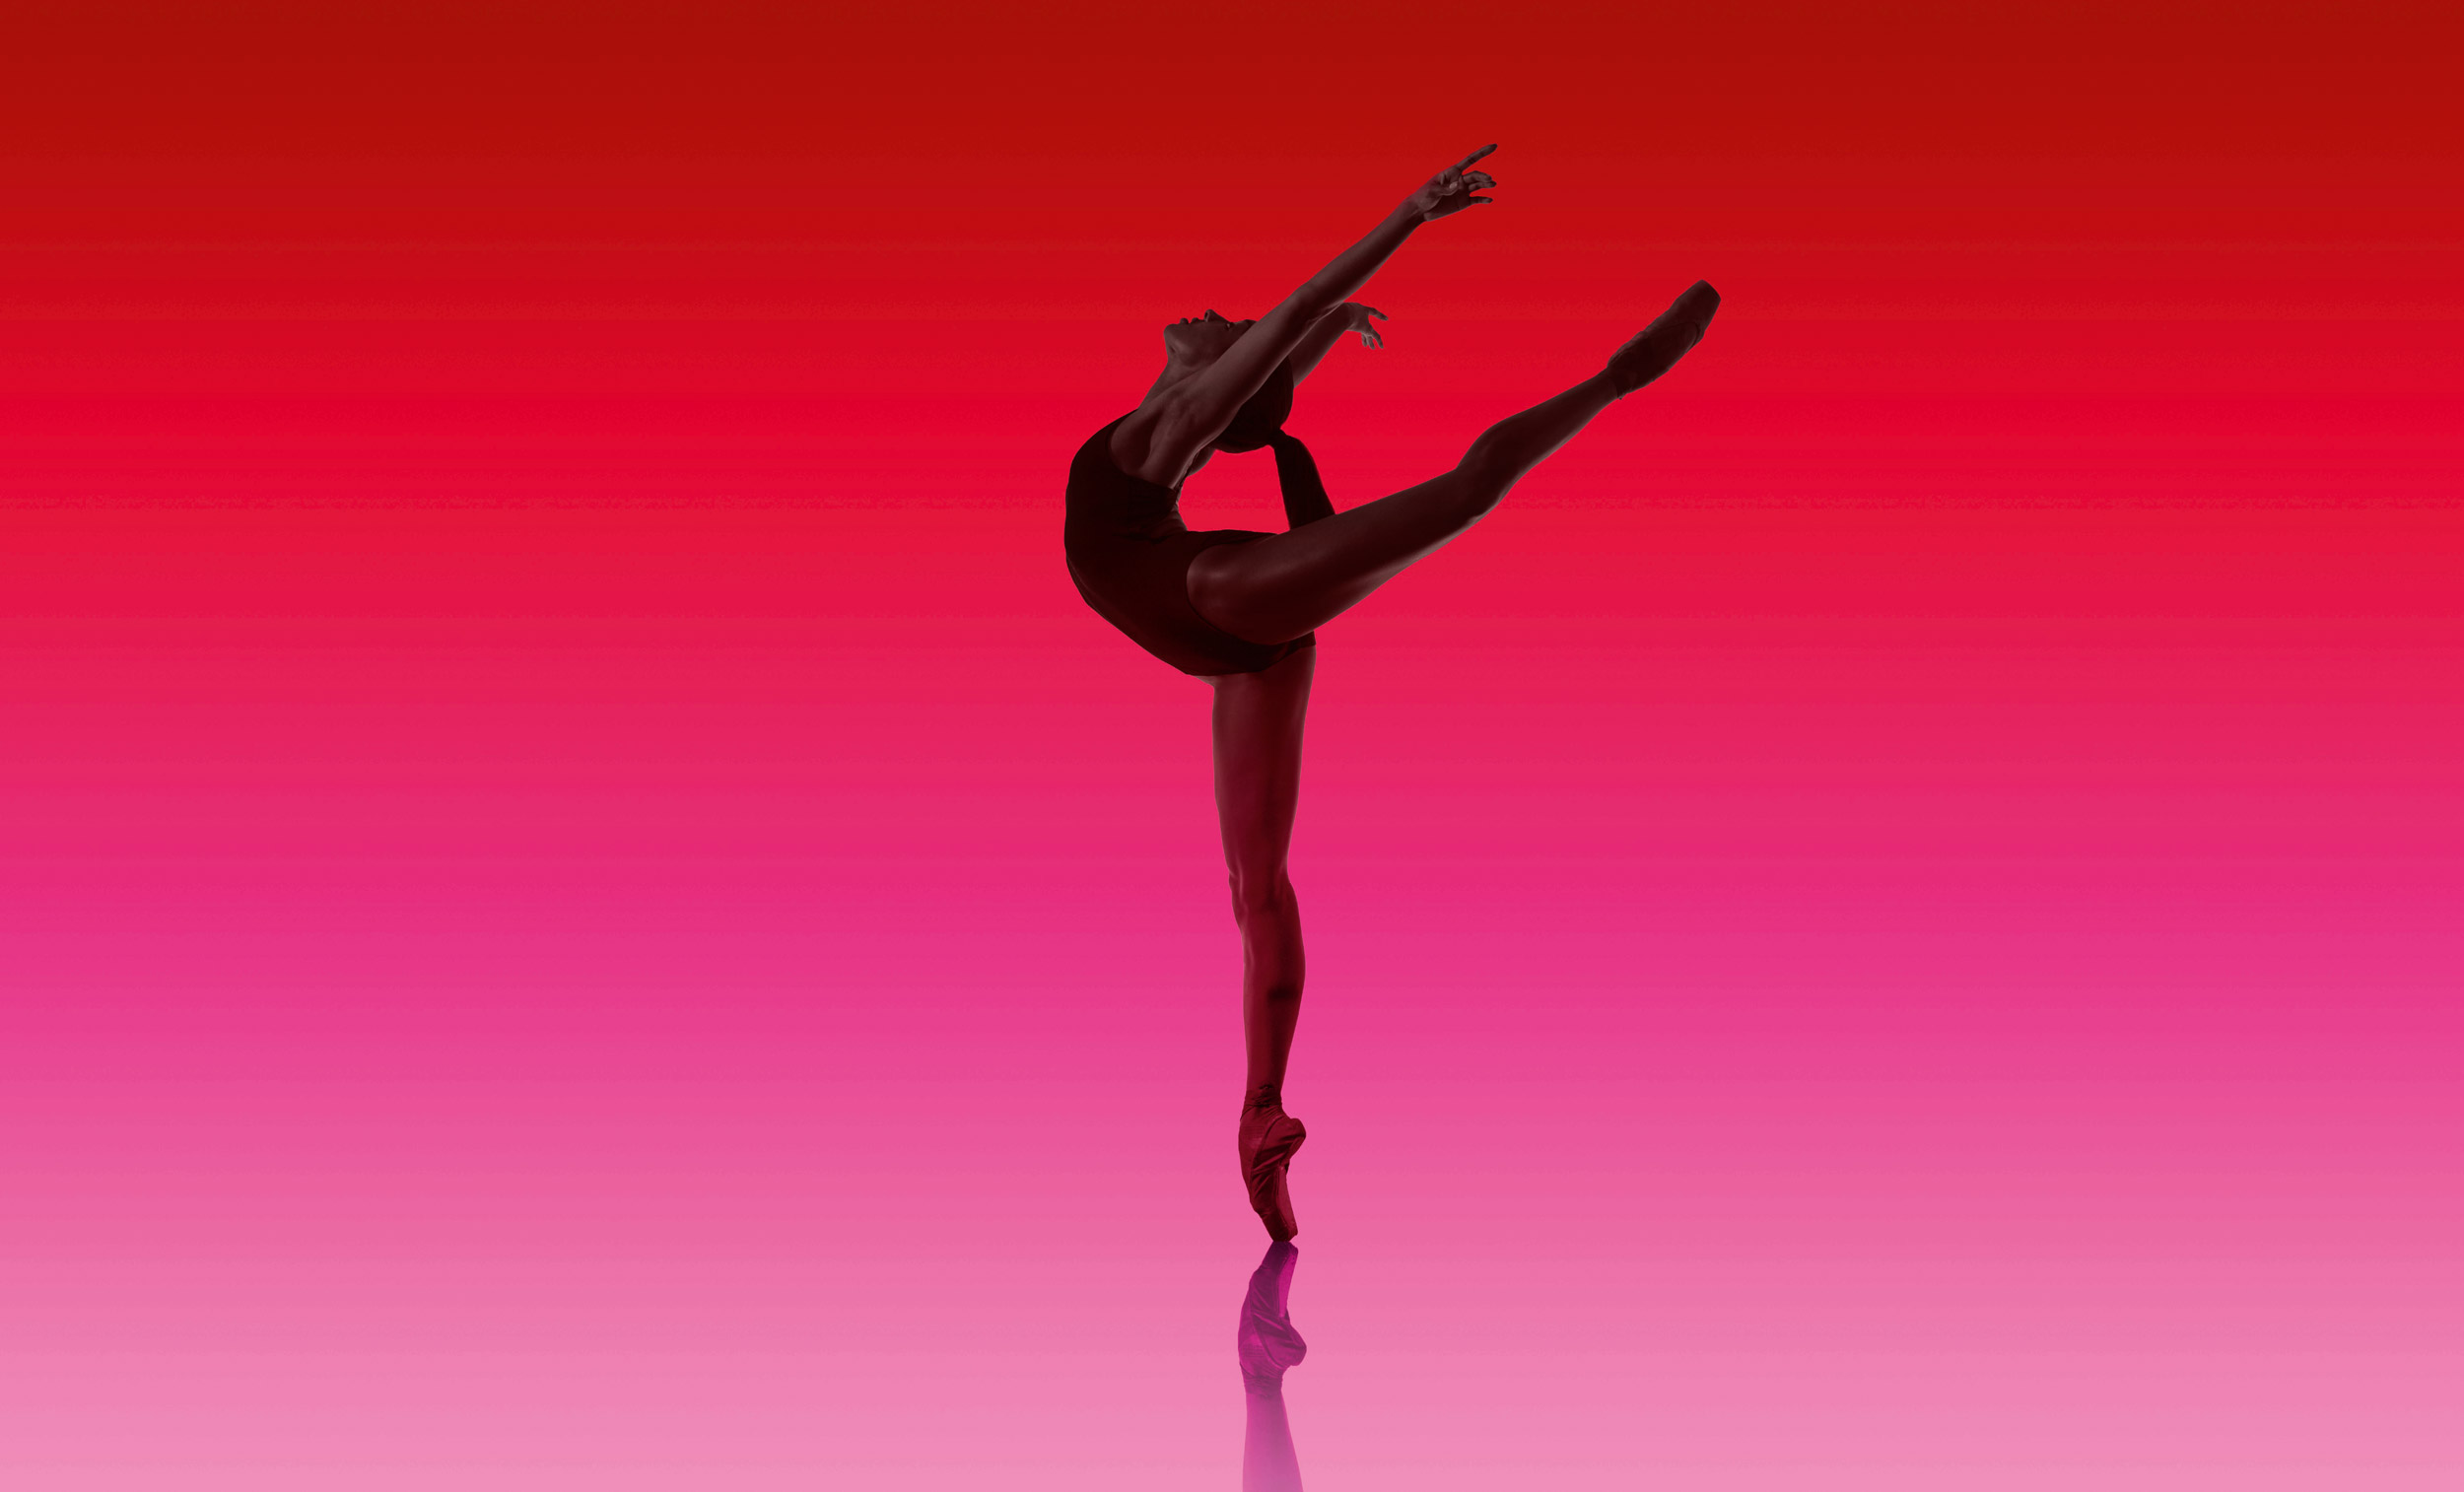 Precious-Adams-1-photo-Perry-Curties-Art-Direction-and-Design-Charlotte-Wilkinson-Studio